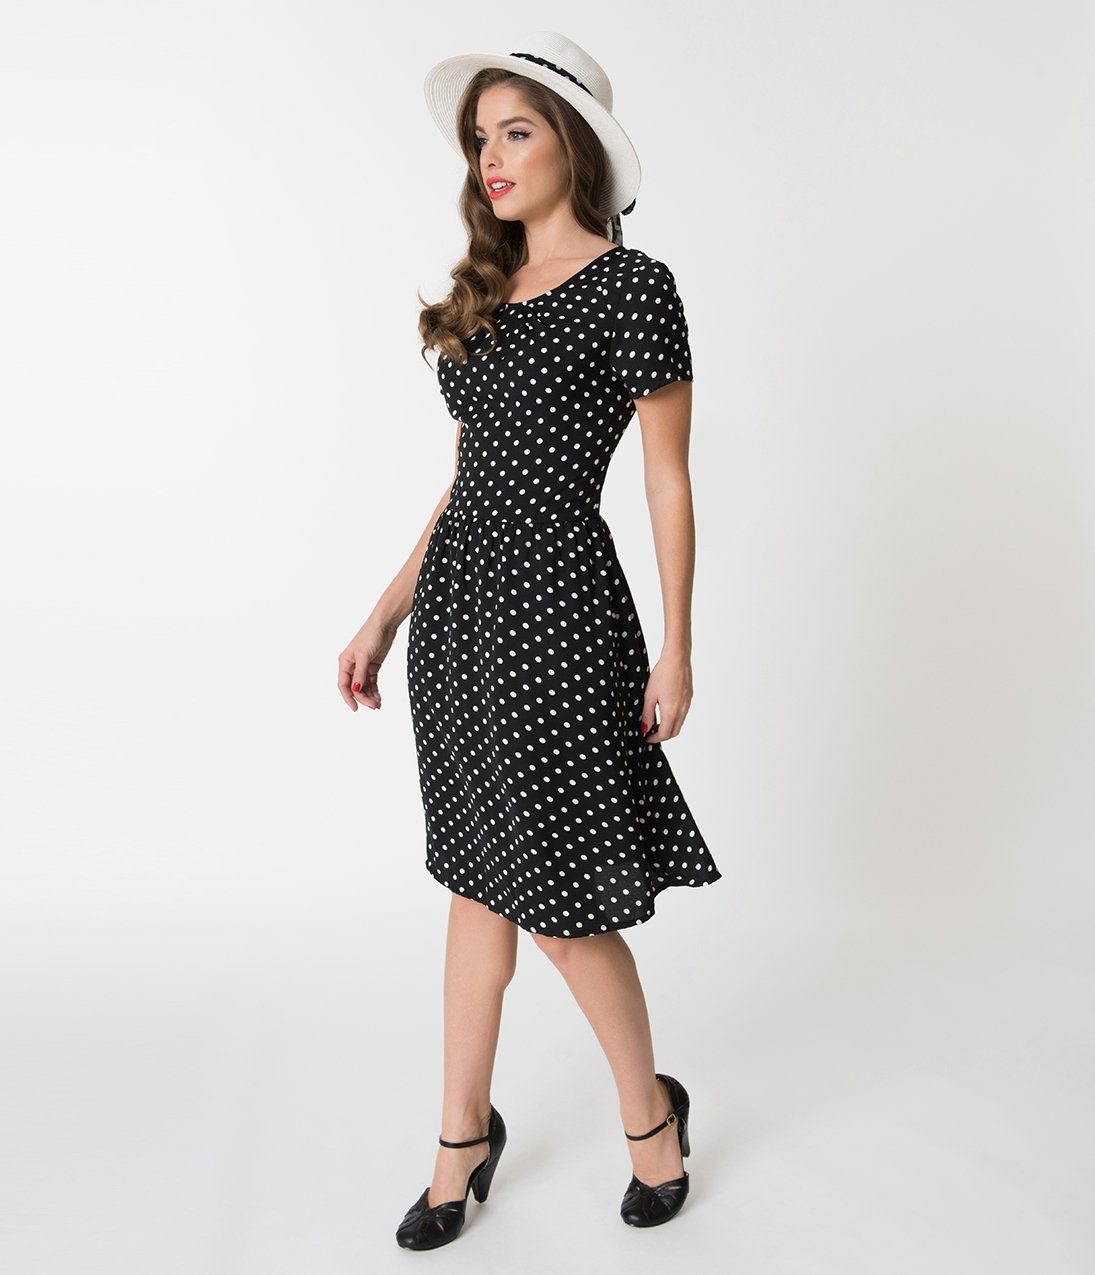 0c29444875d3 Vintage 50s Dresses: Best 1950s Dress Styles 1950S Style Black White Polka  Dot Short Sleeve Elizabeth Swing Dress $58.00 AT vintagedancer.com